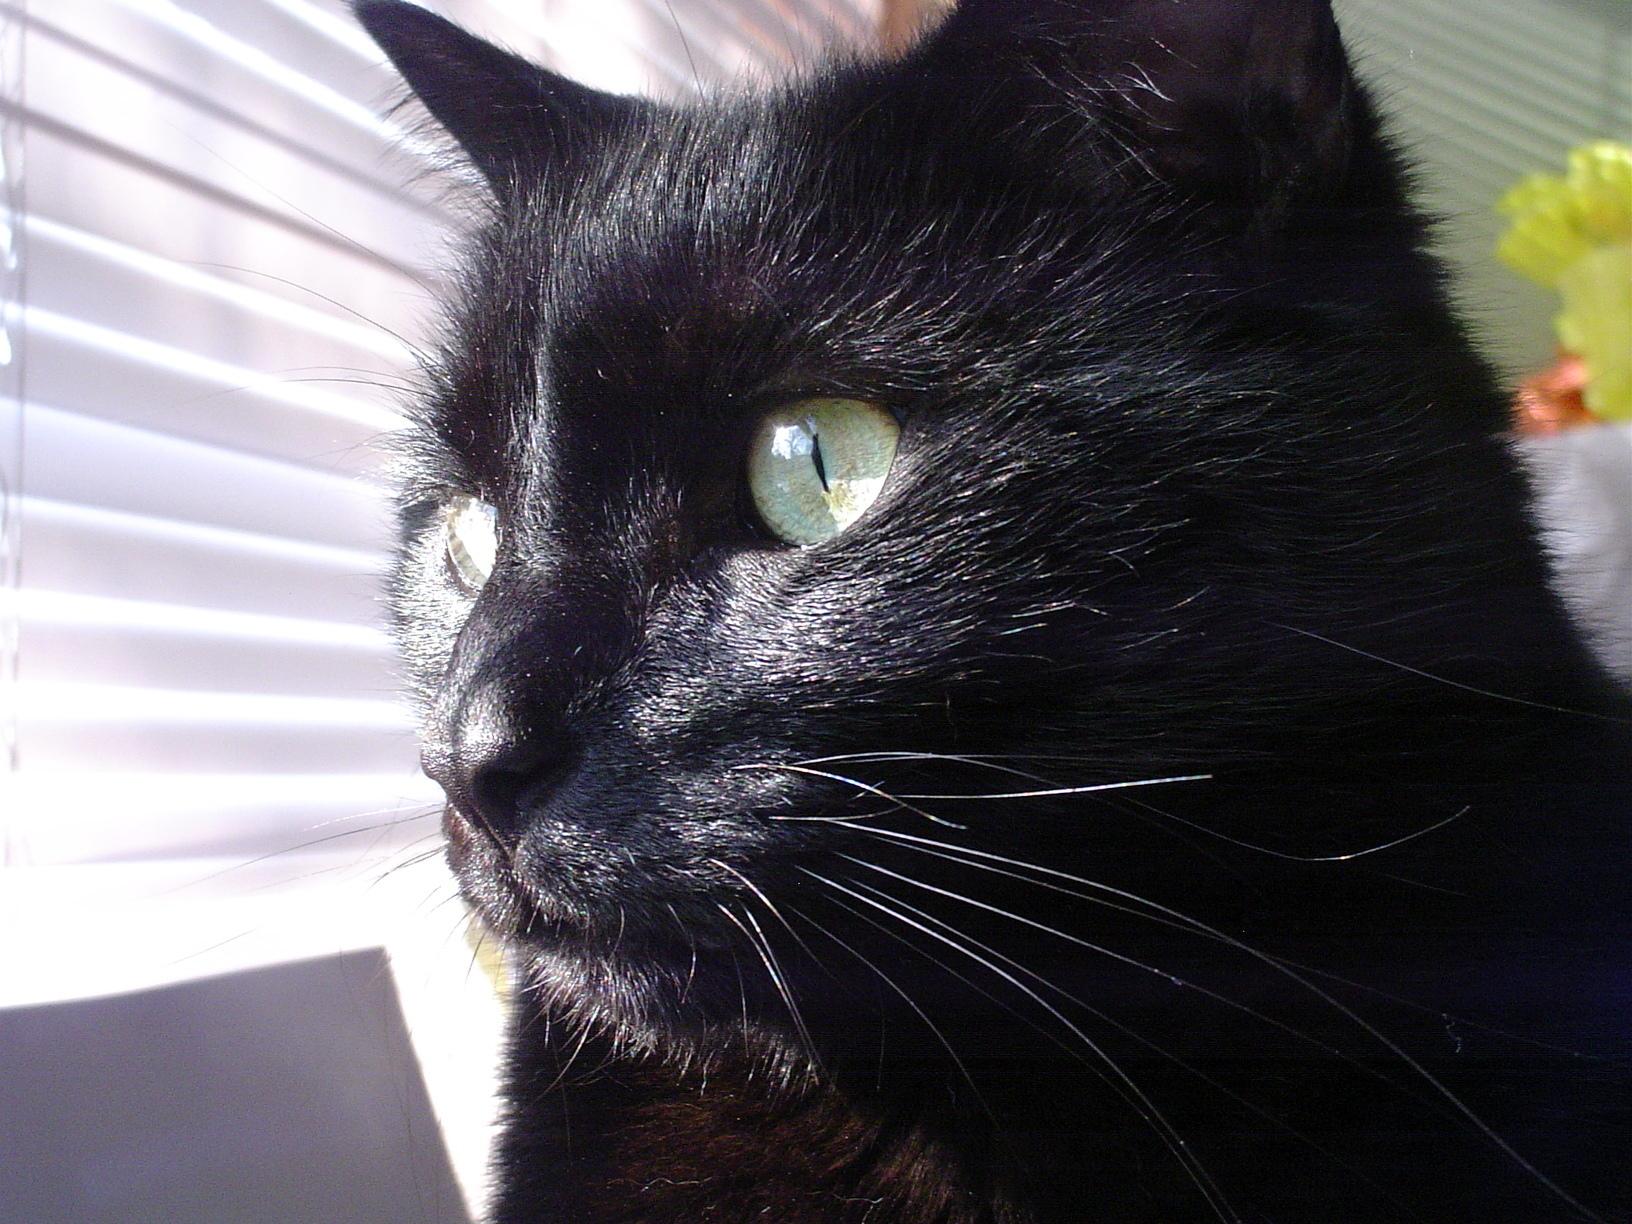 black cat avatar avatar movie avatar the last airbender the: dopepicz.com/2600629-cat-avatar.html